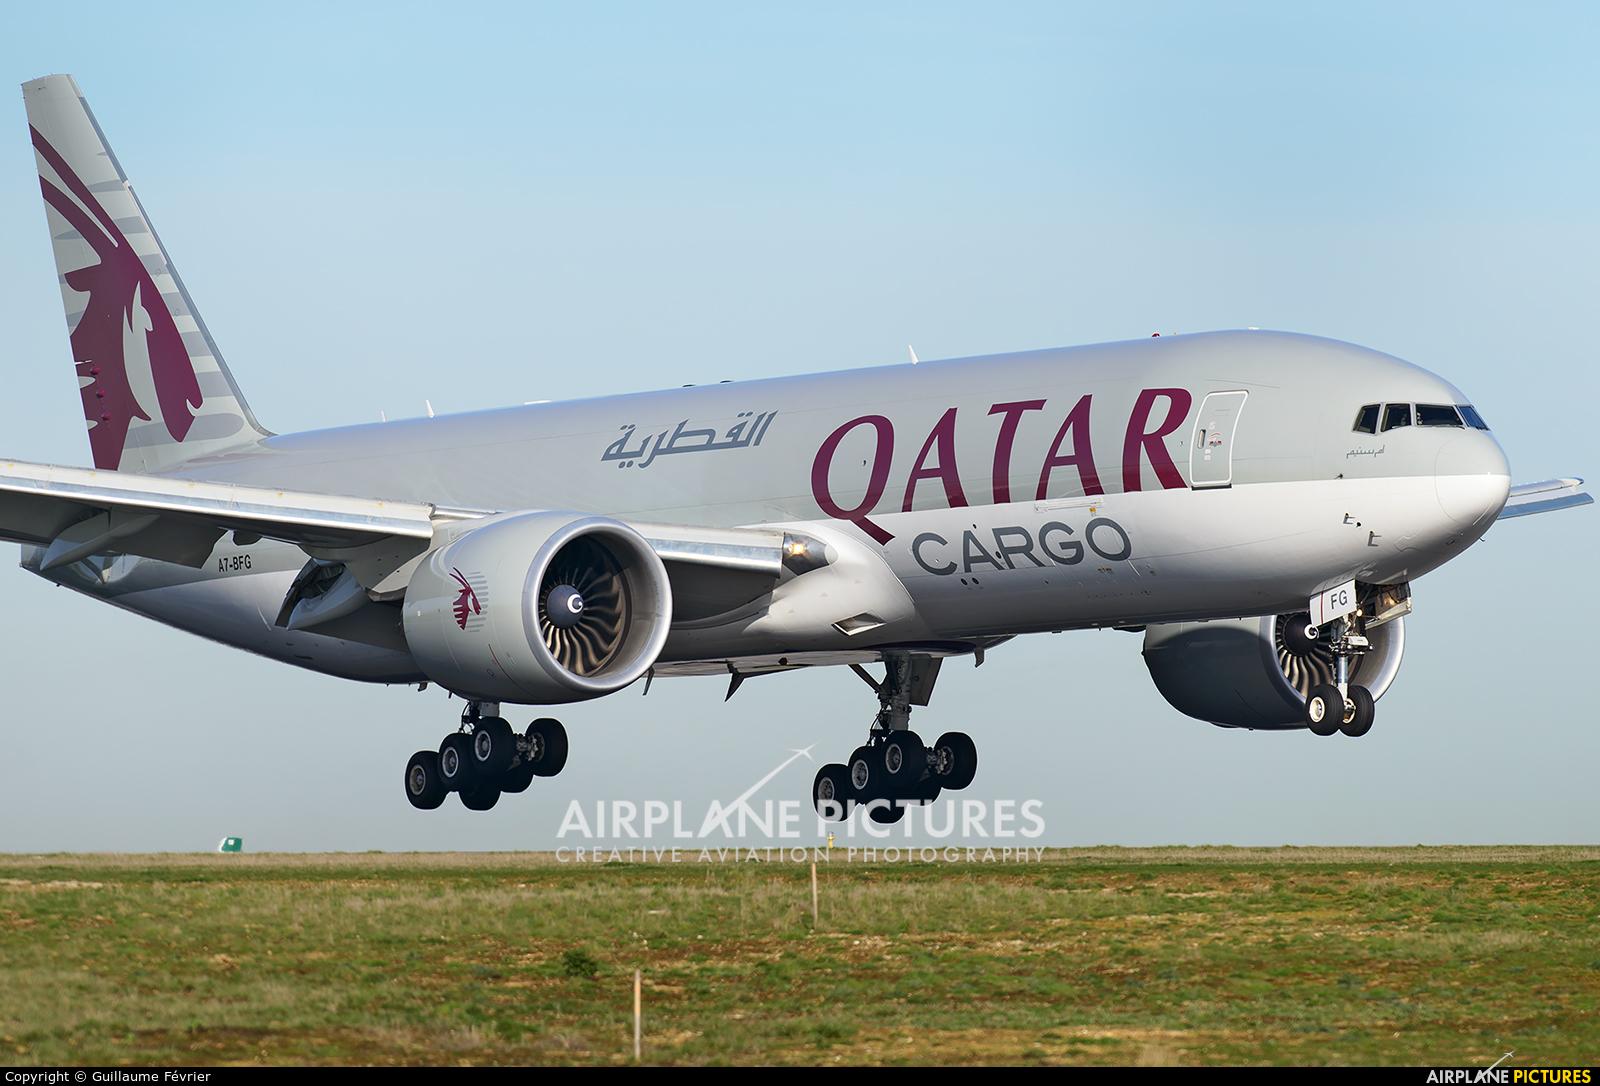 Qatar Airways Cargo A7-BFG aircraft at Paris - Charles de Gaulle